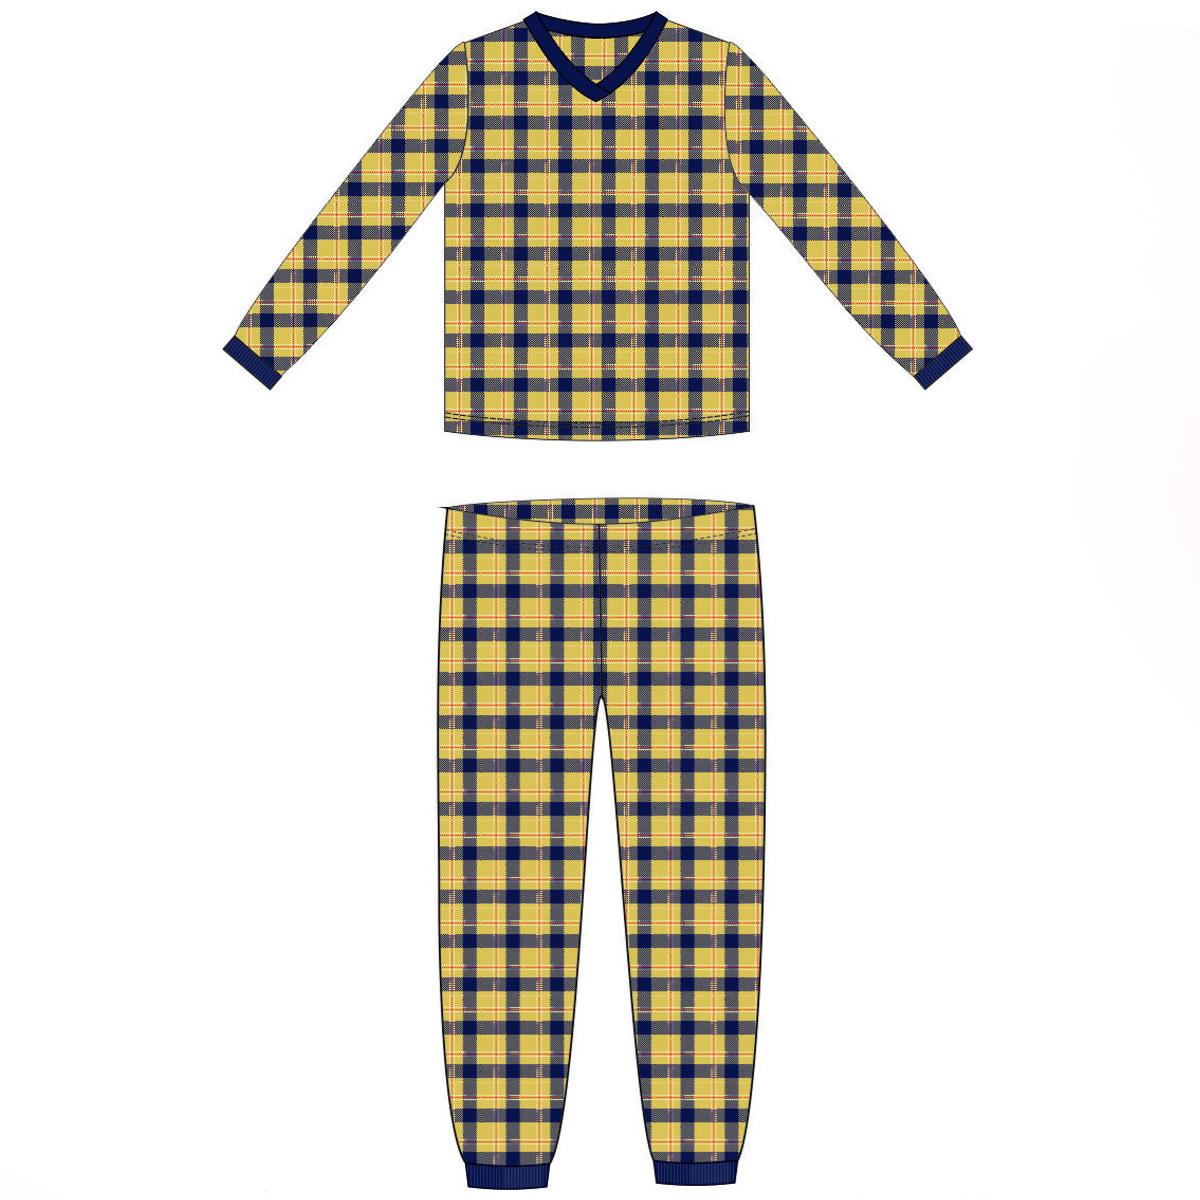 Пижама для мальчика Ёмаё (18-301) рост 92 клетка бежевая<br>